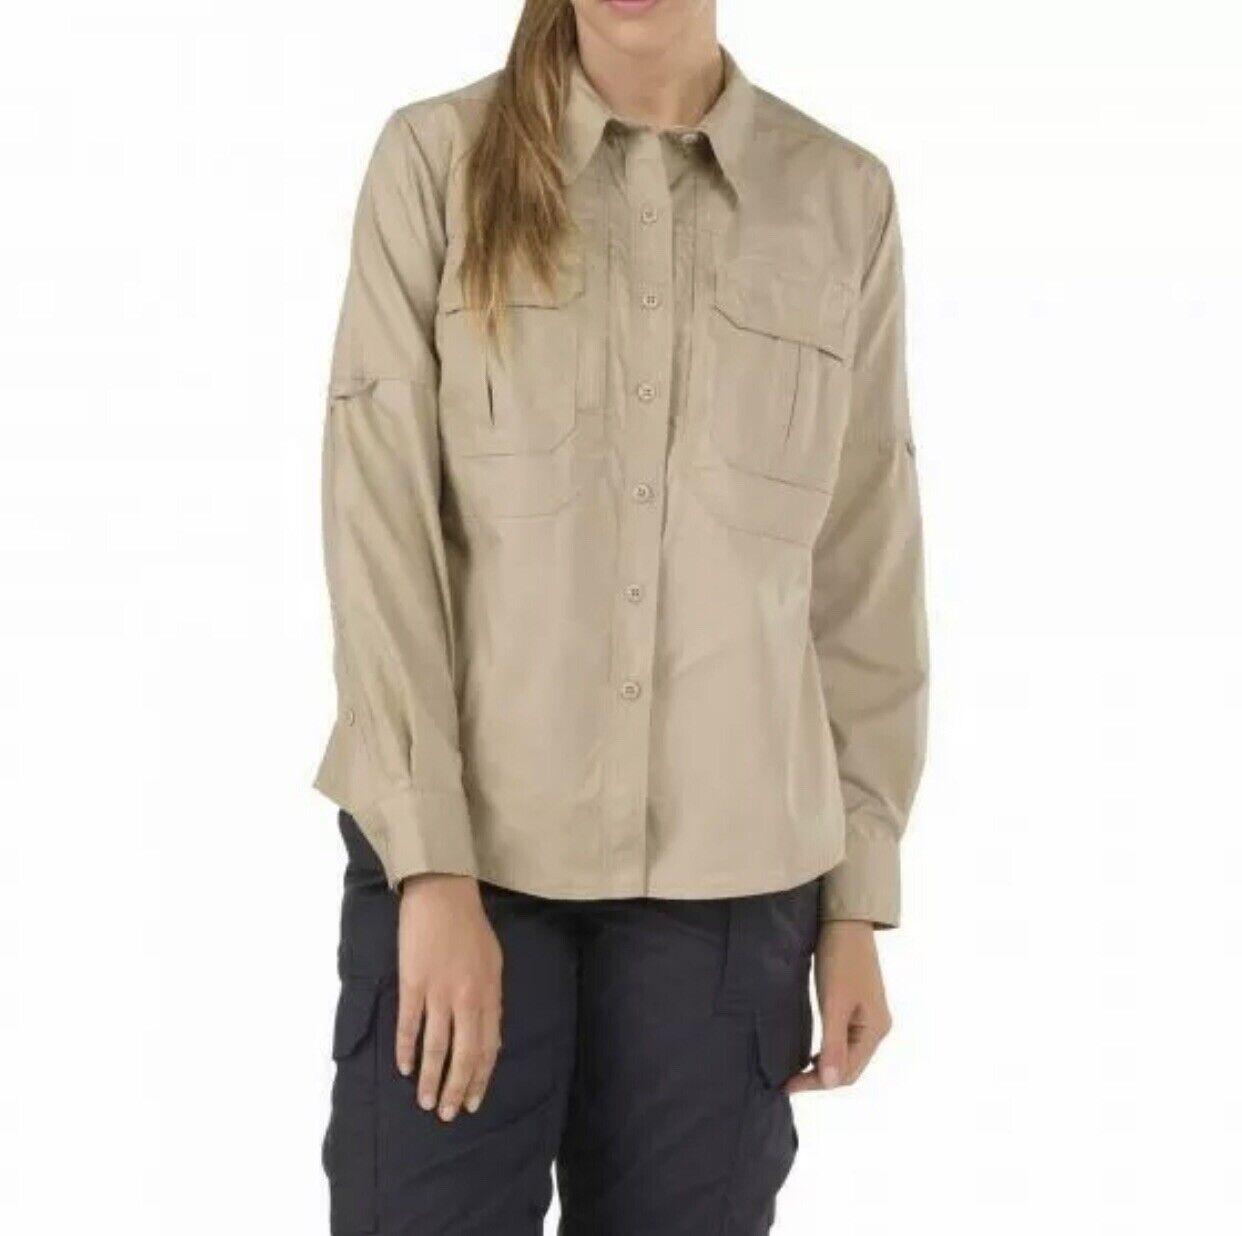 5.11 Womens Medium Tactical  Taclite Pro Shirt Long Sleeve Khaki Button Front NWT  online fashion shopping